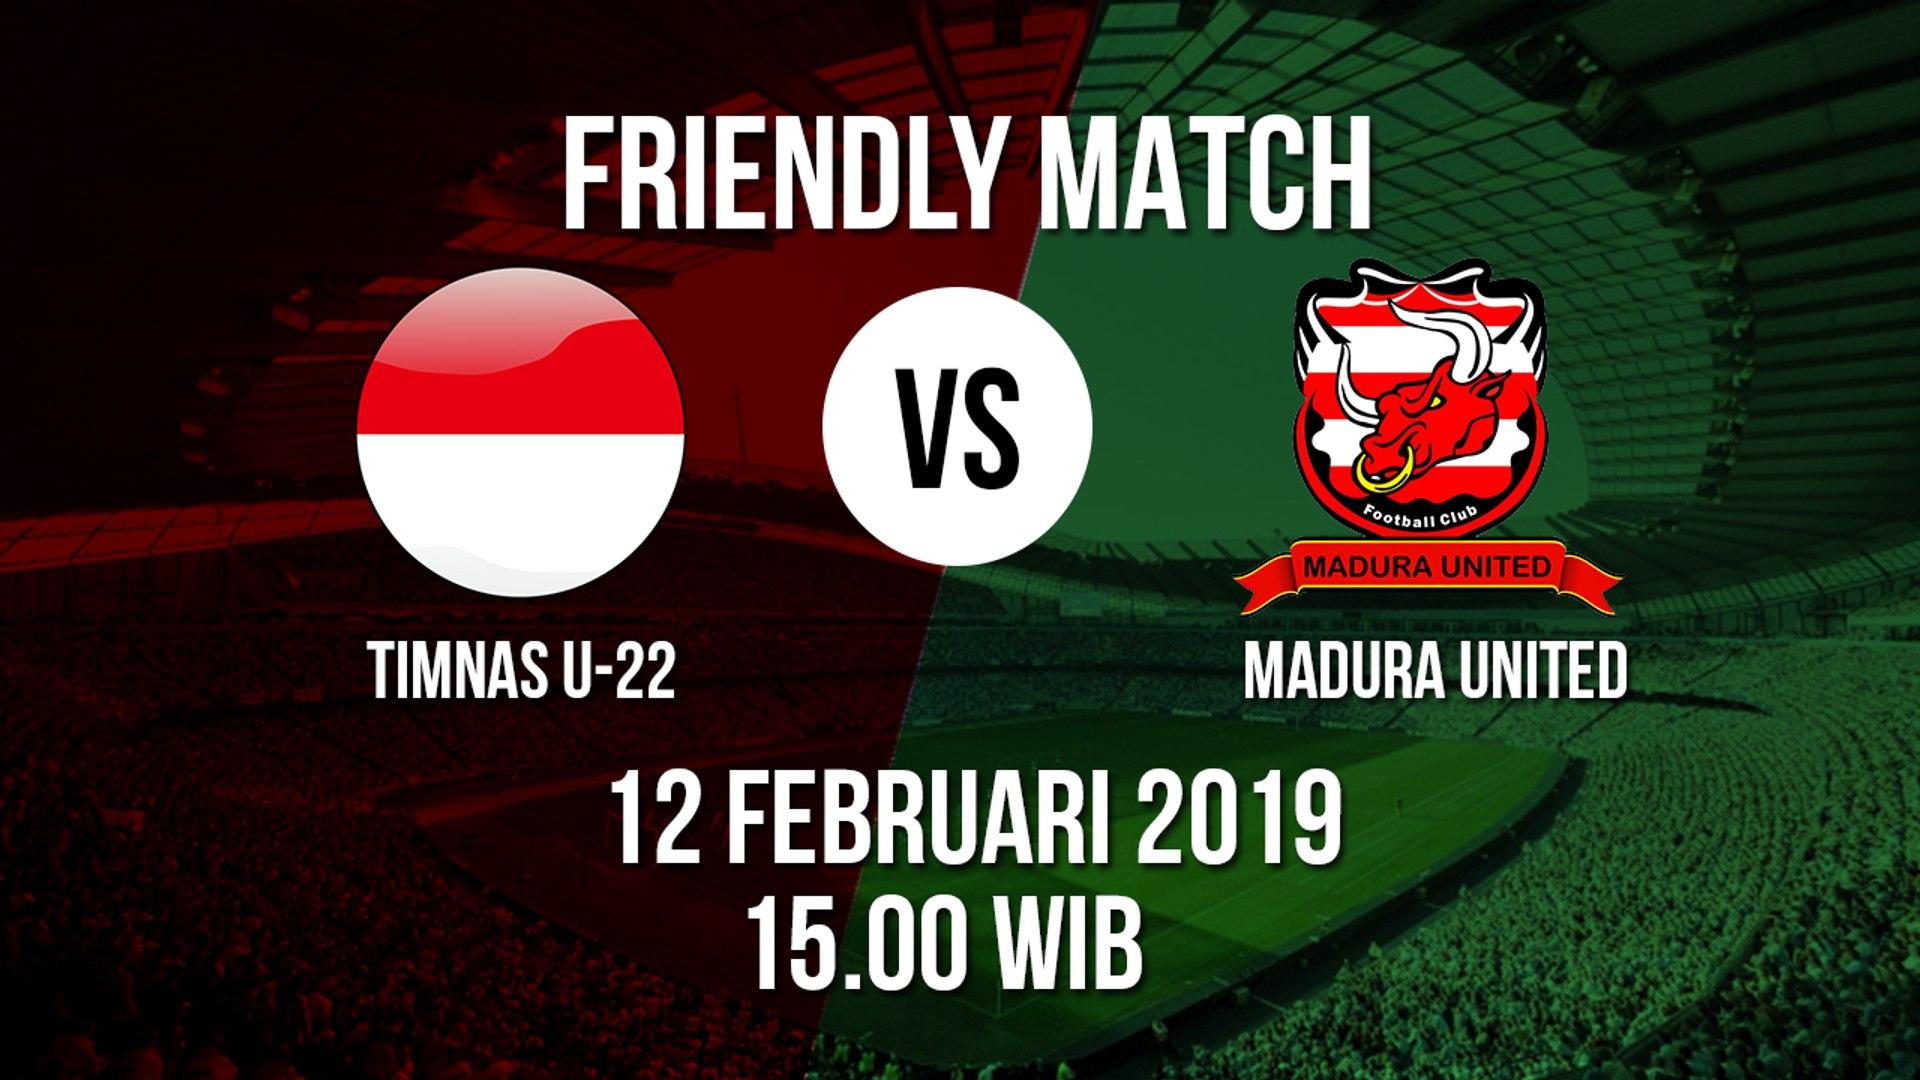 Sedang Berlangsung Timnas Indonesia U-22 Vs Madura United Pukul 15.00 WIB